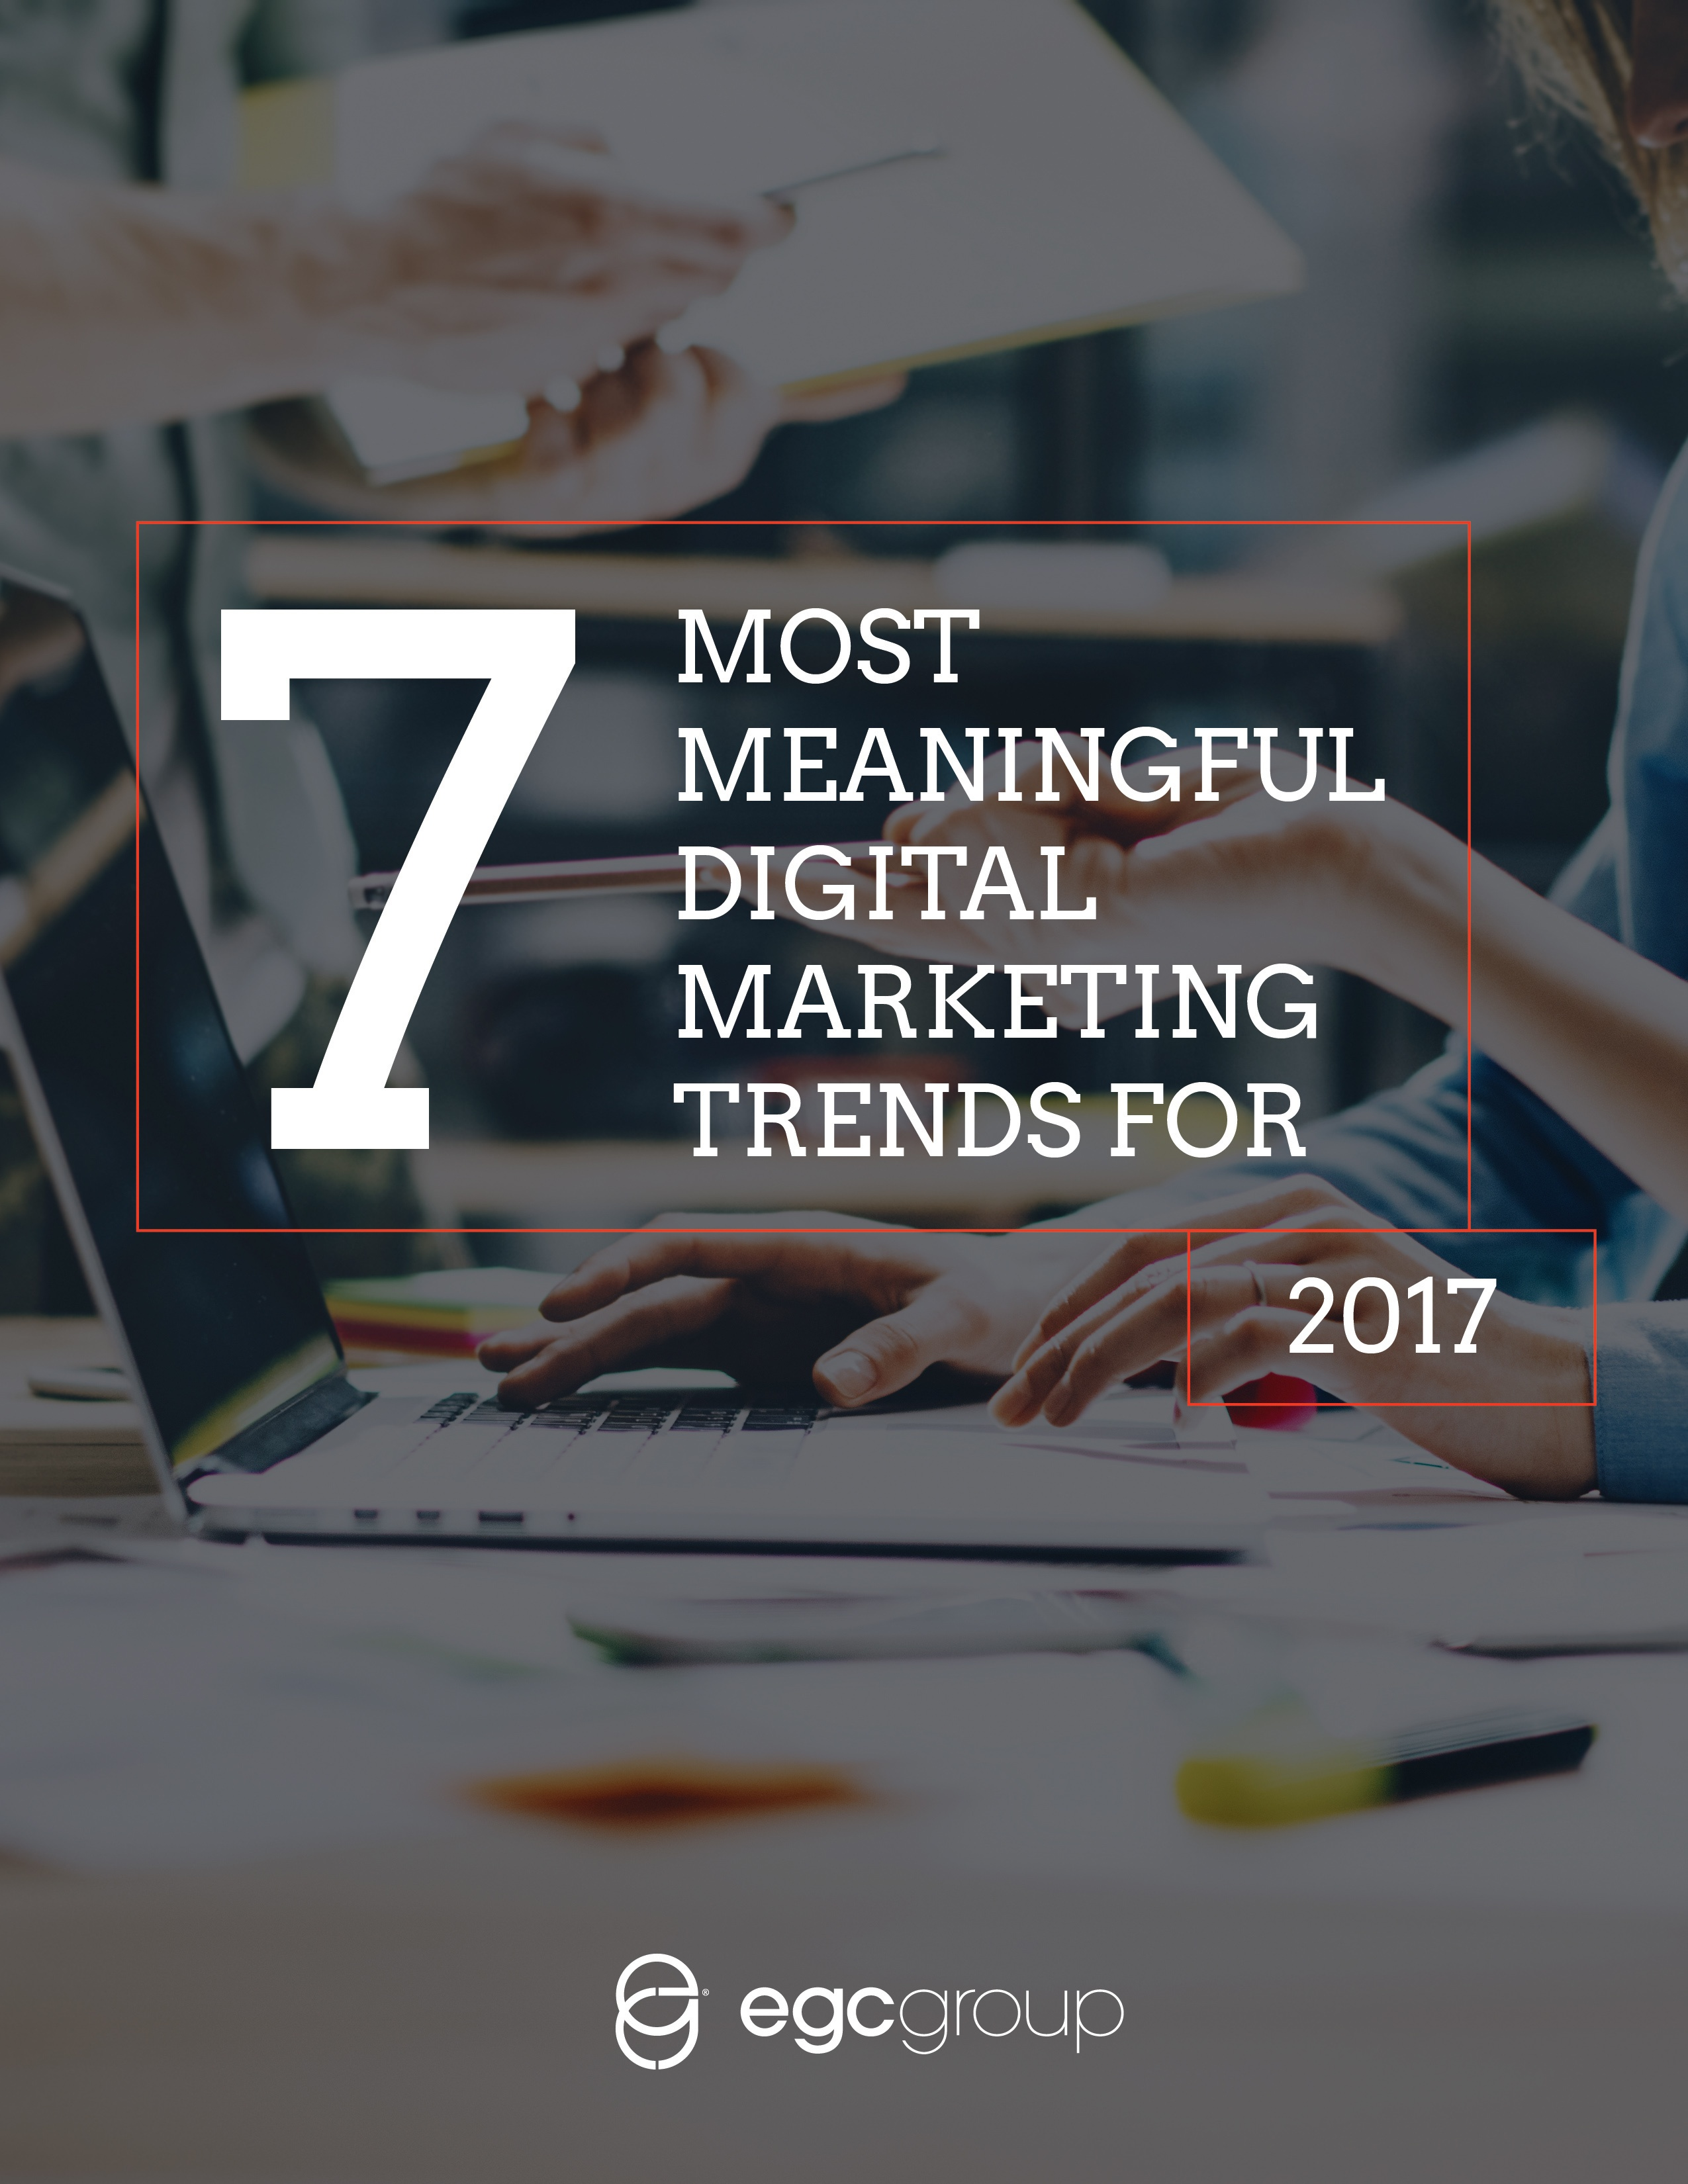 MarketingTrends_ebook guide.jpg